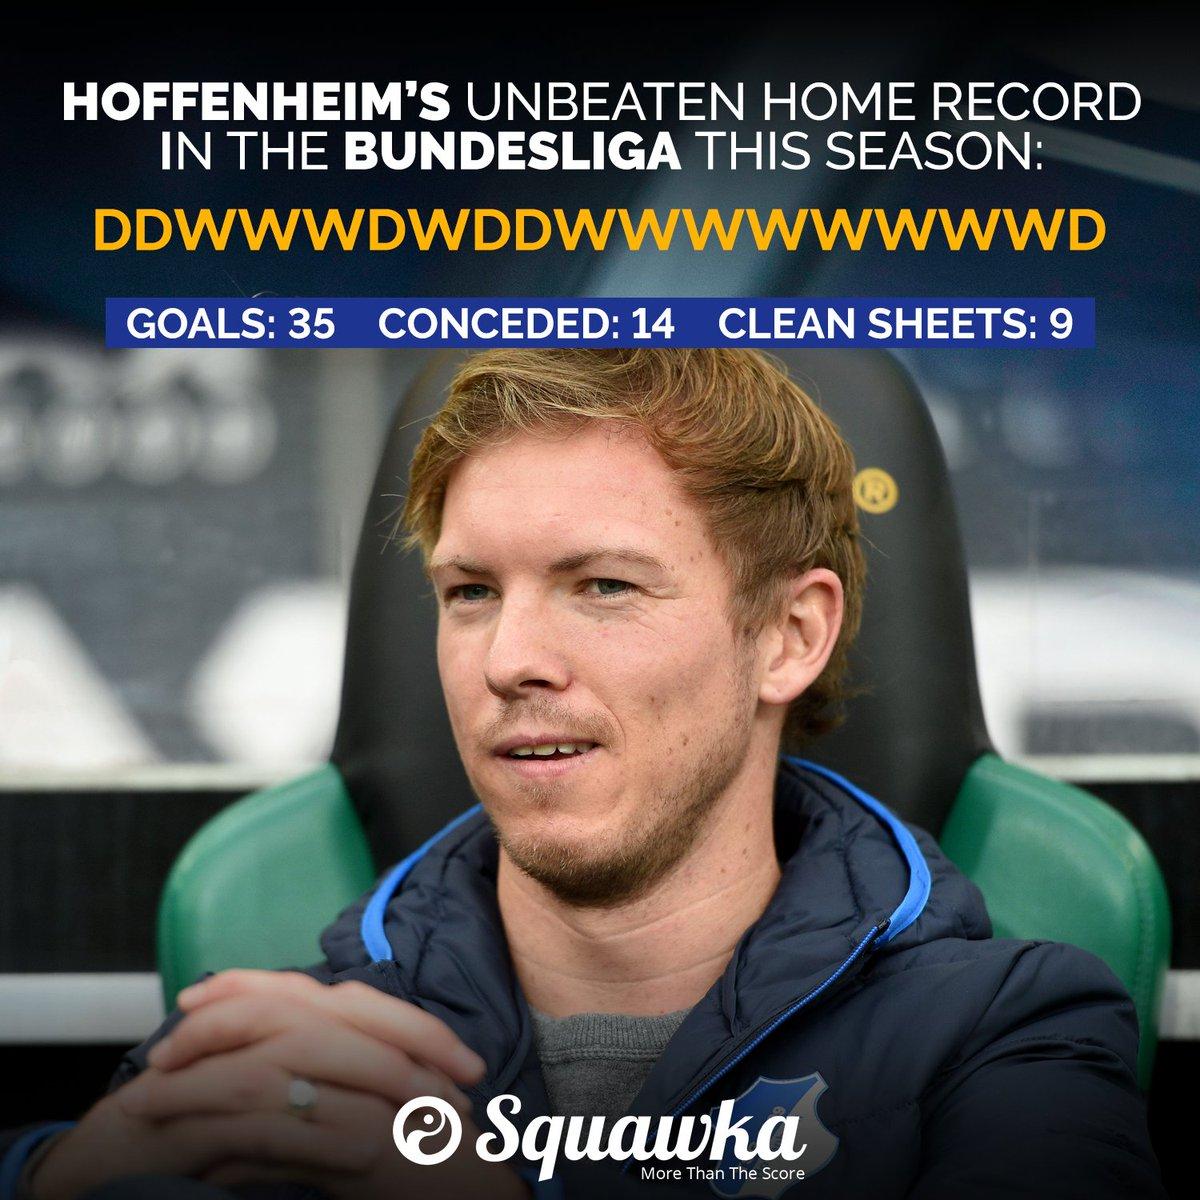 Hoffenheim's unbeaten home season in the #Bundesliga 2016/17:  DDWWWDWDDWWWWWWWWD  Goals: 35 Clean sheets: 9  The Nagelsmann effect.  <br>http://pic.twitter.com/wKspG8jzoH